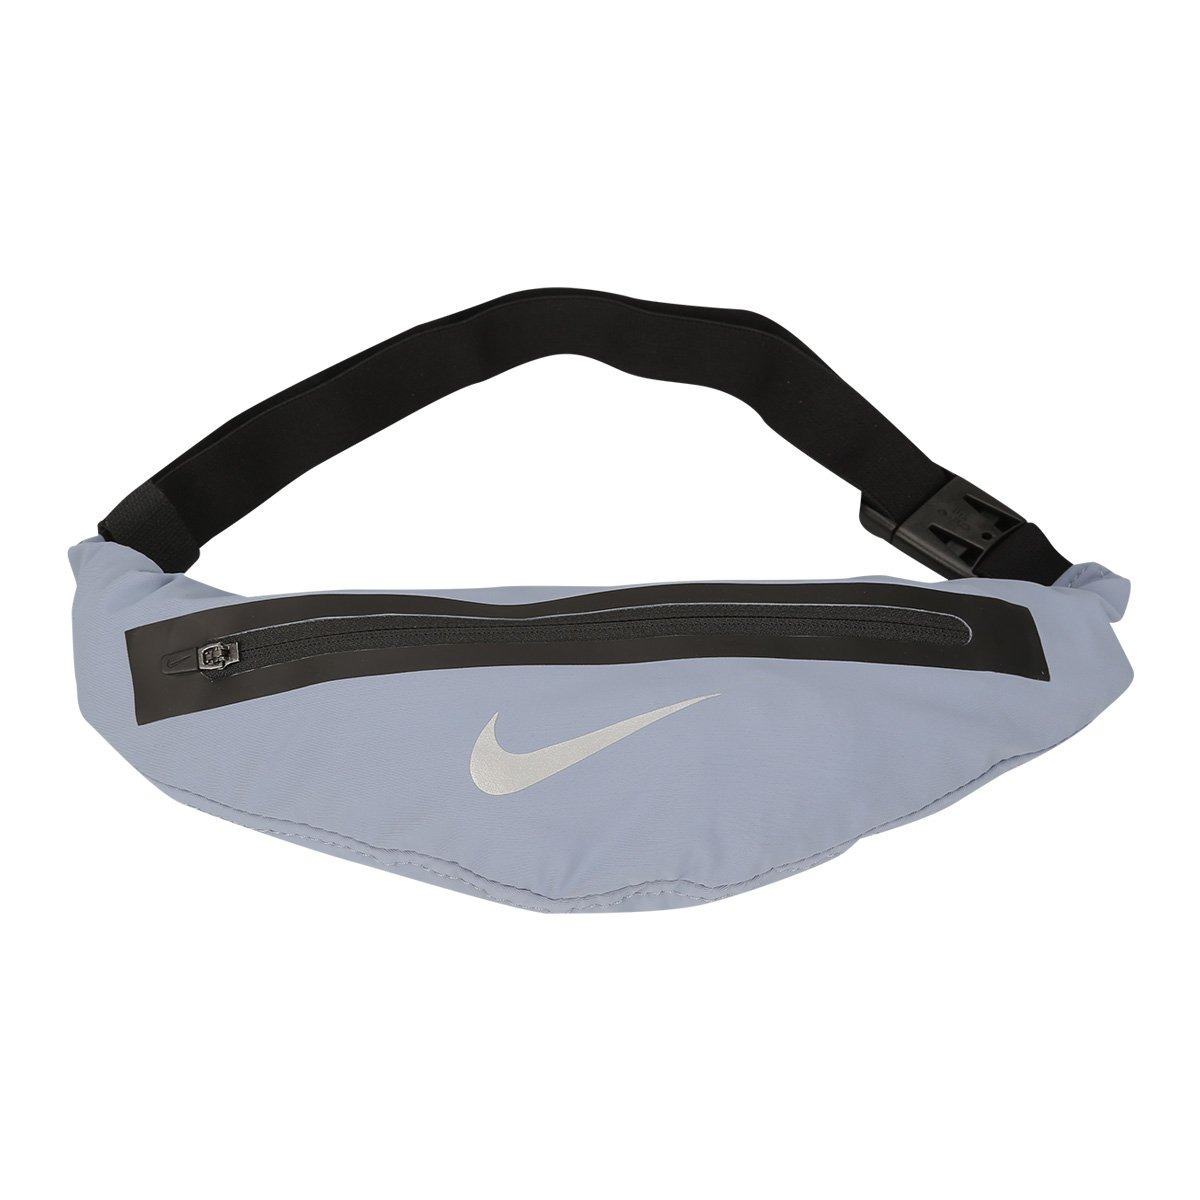 f82143b63 Riñonera Nike Waistpack - Rosa - $ 1.309,00 en Mercado Libre